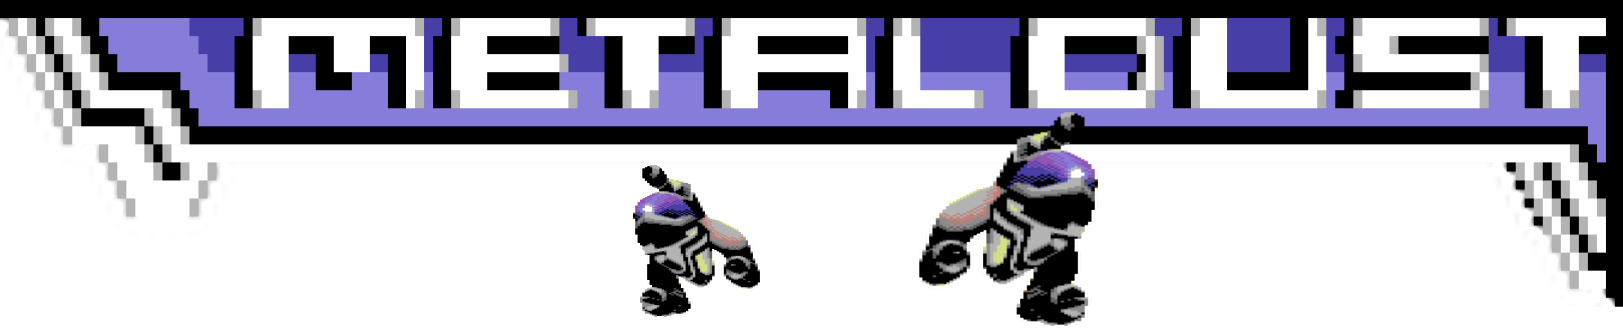 Metal Dust (C64 SuperCPU)